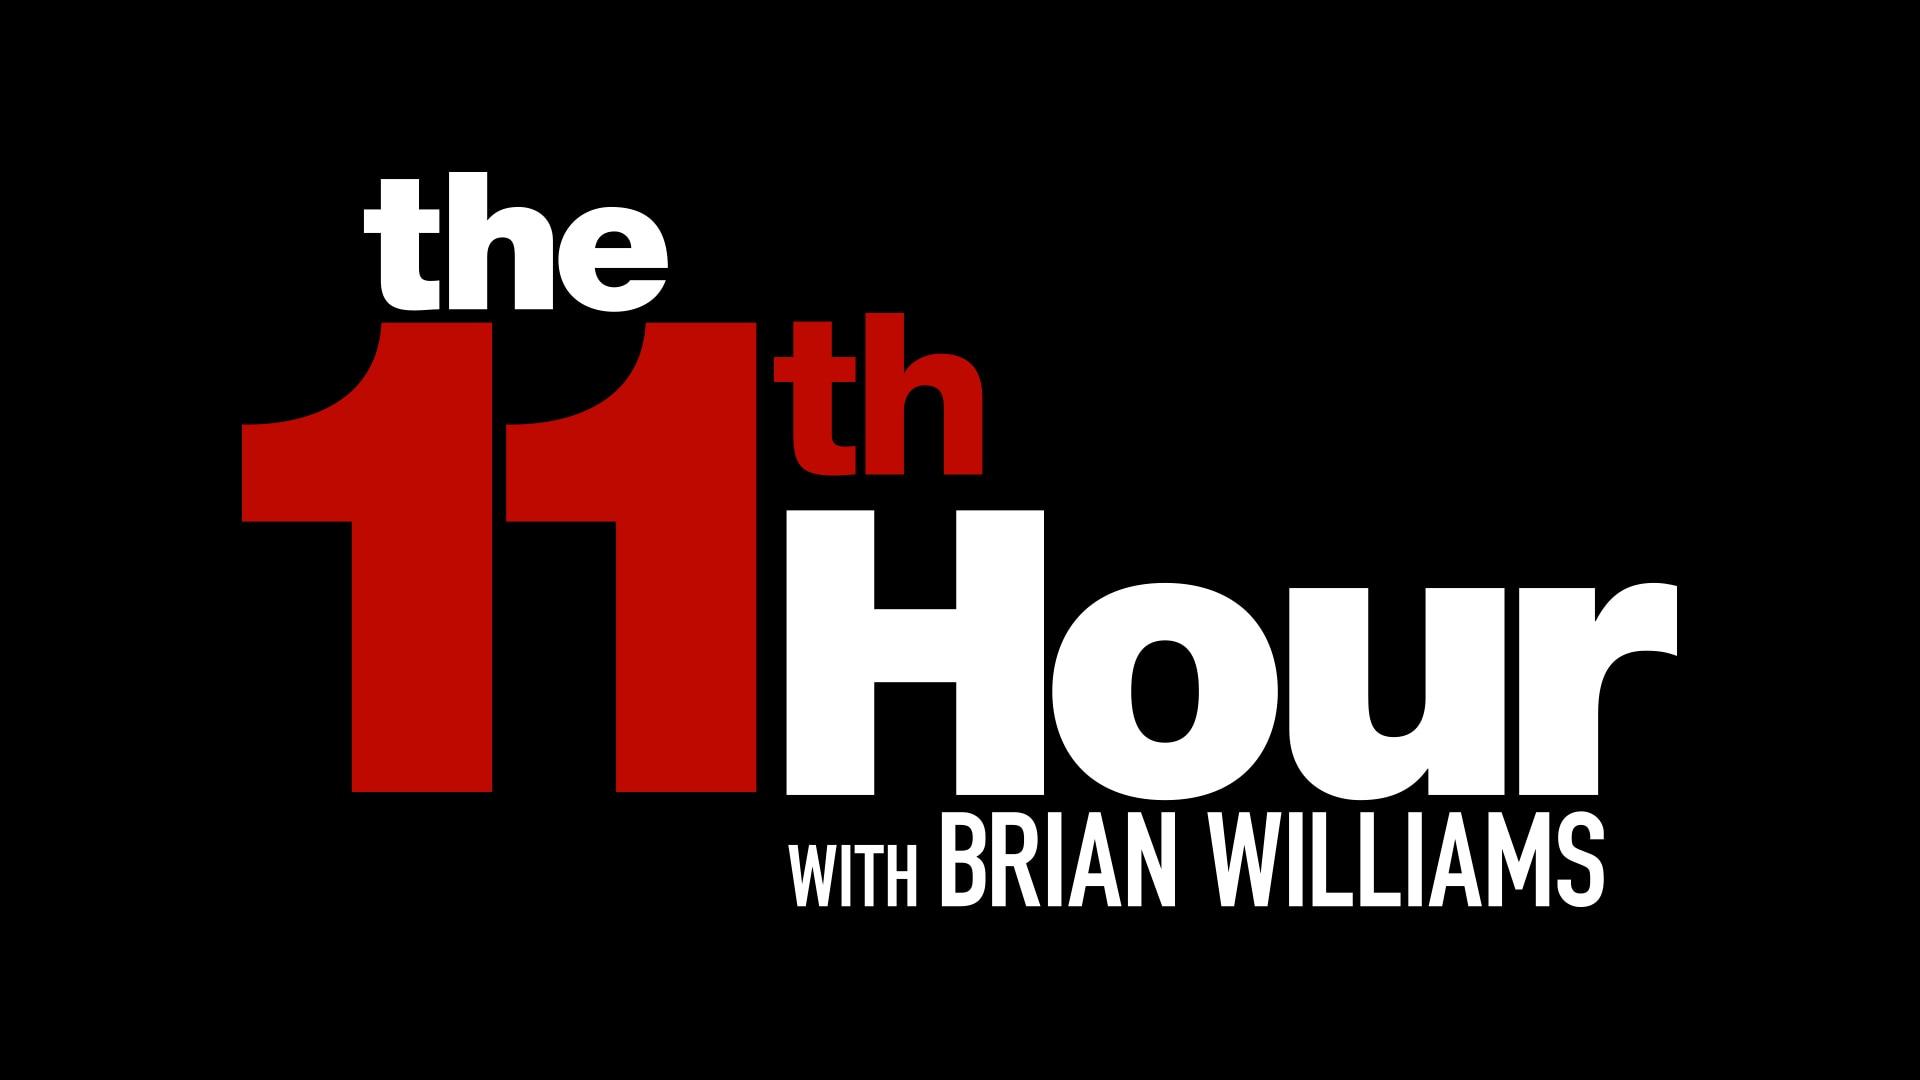 The 11th Hour with Brian Williams - NBC.com